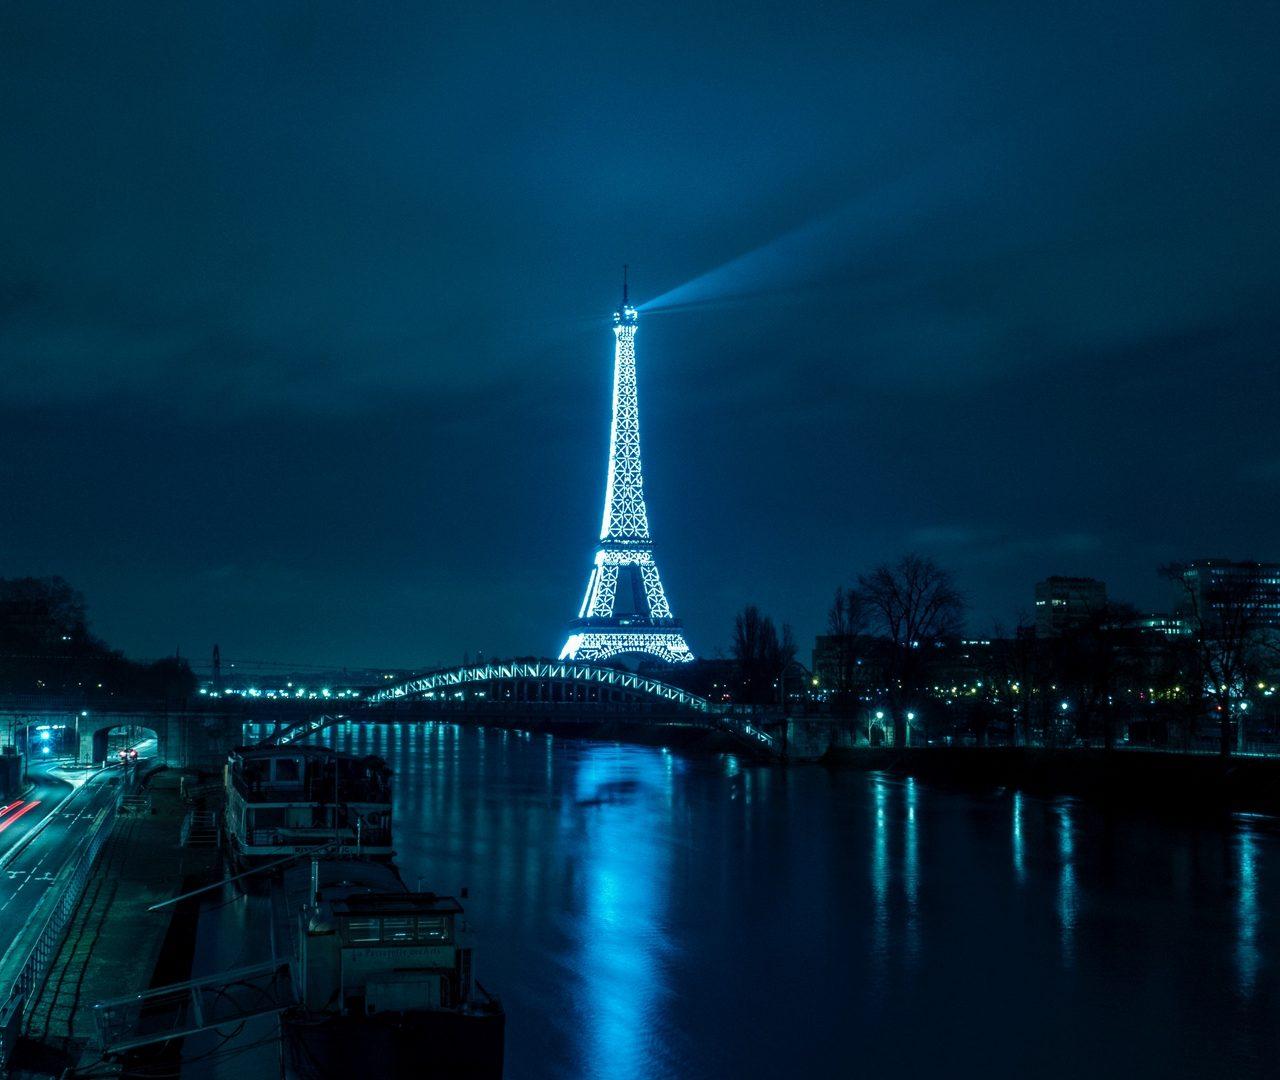 Paris Eiffel Tower Night City River Bridge Desktop